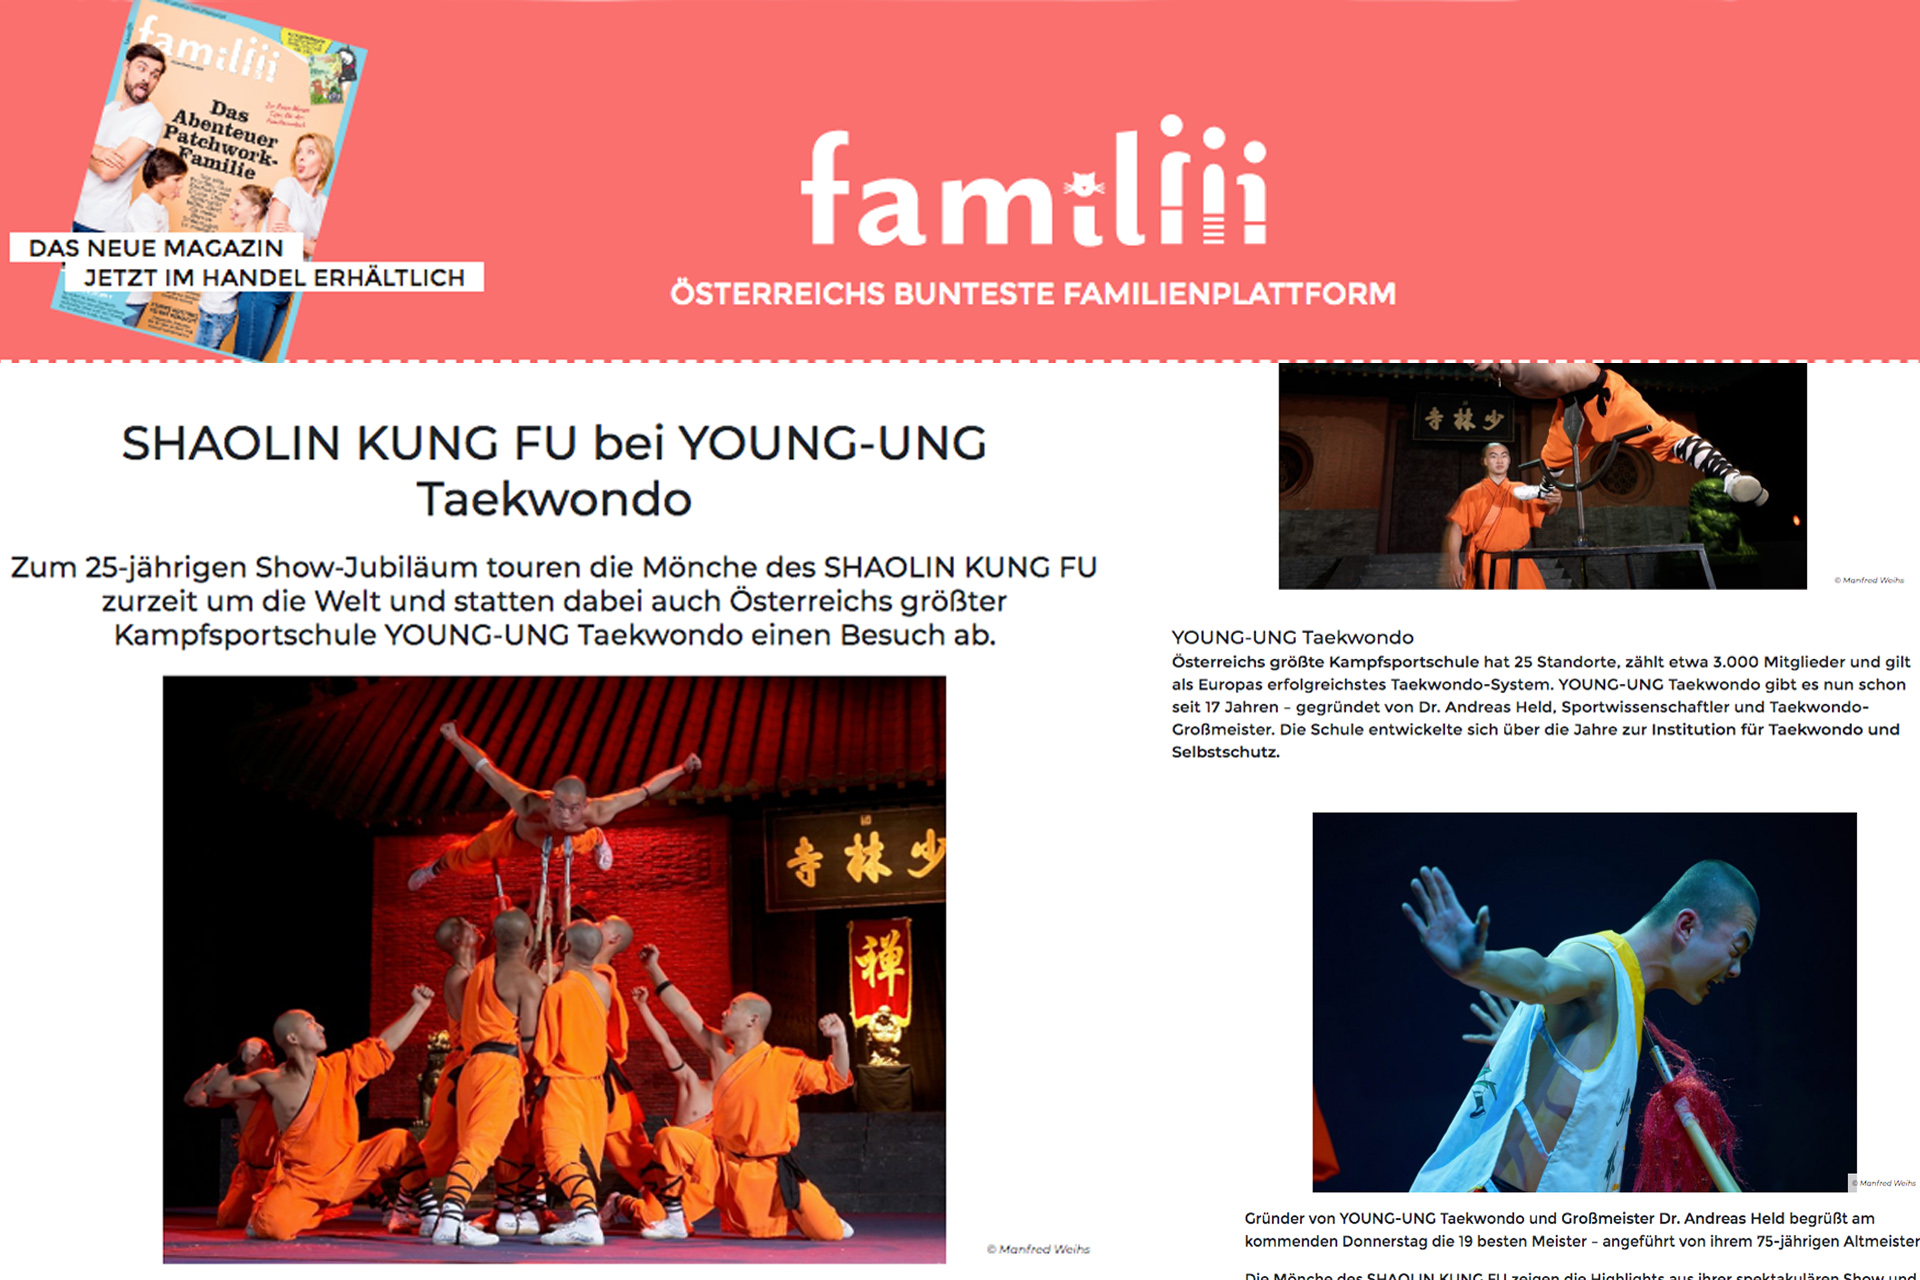 Kung Fu-Mönche in Happy Familiii